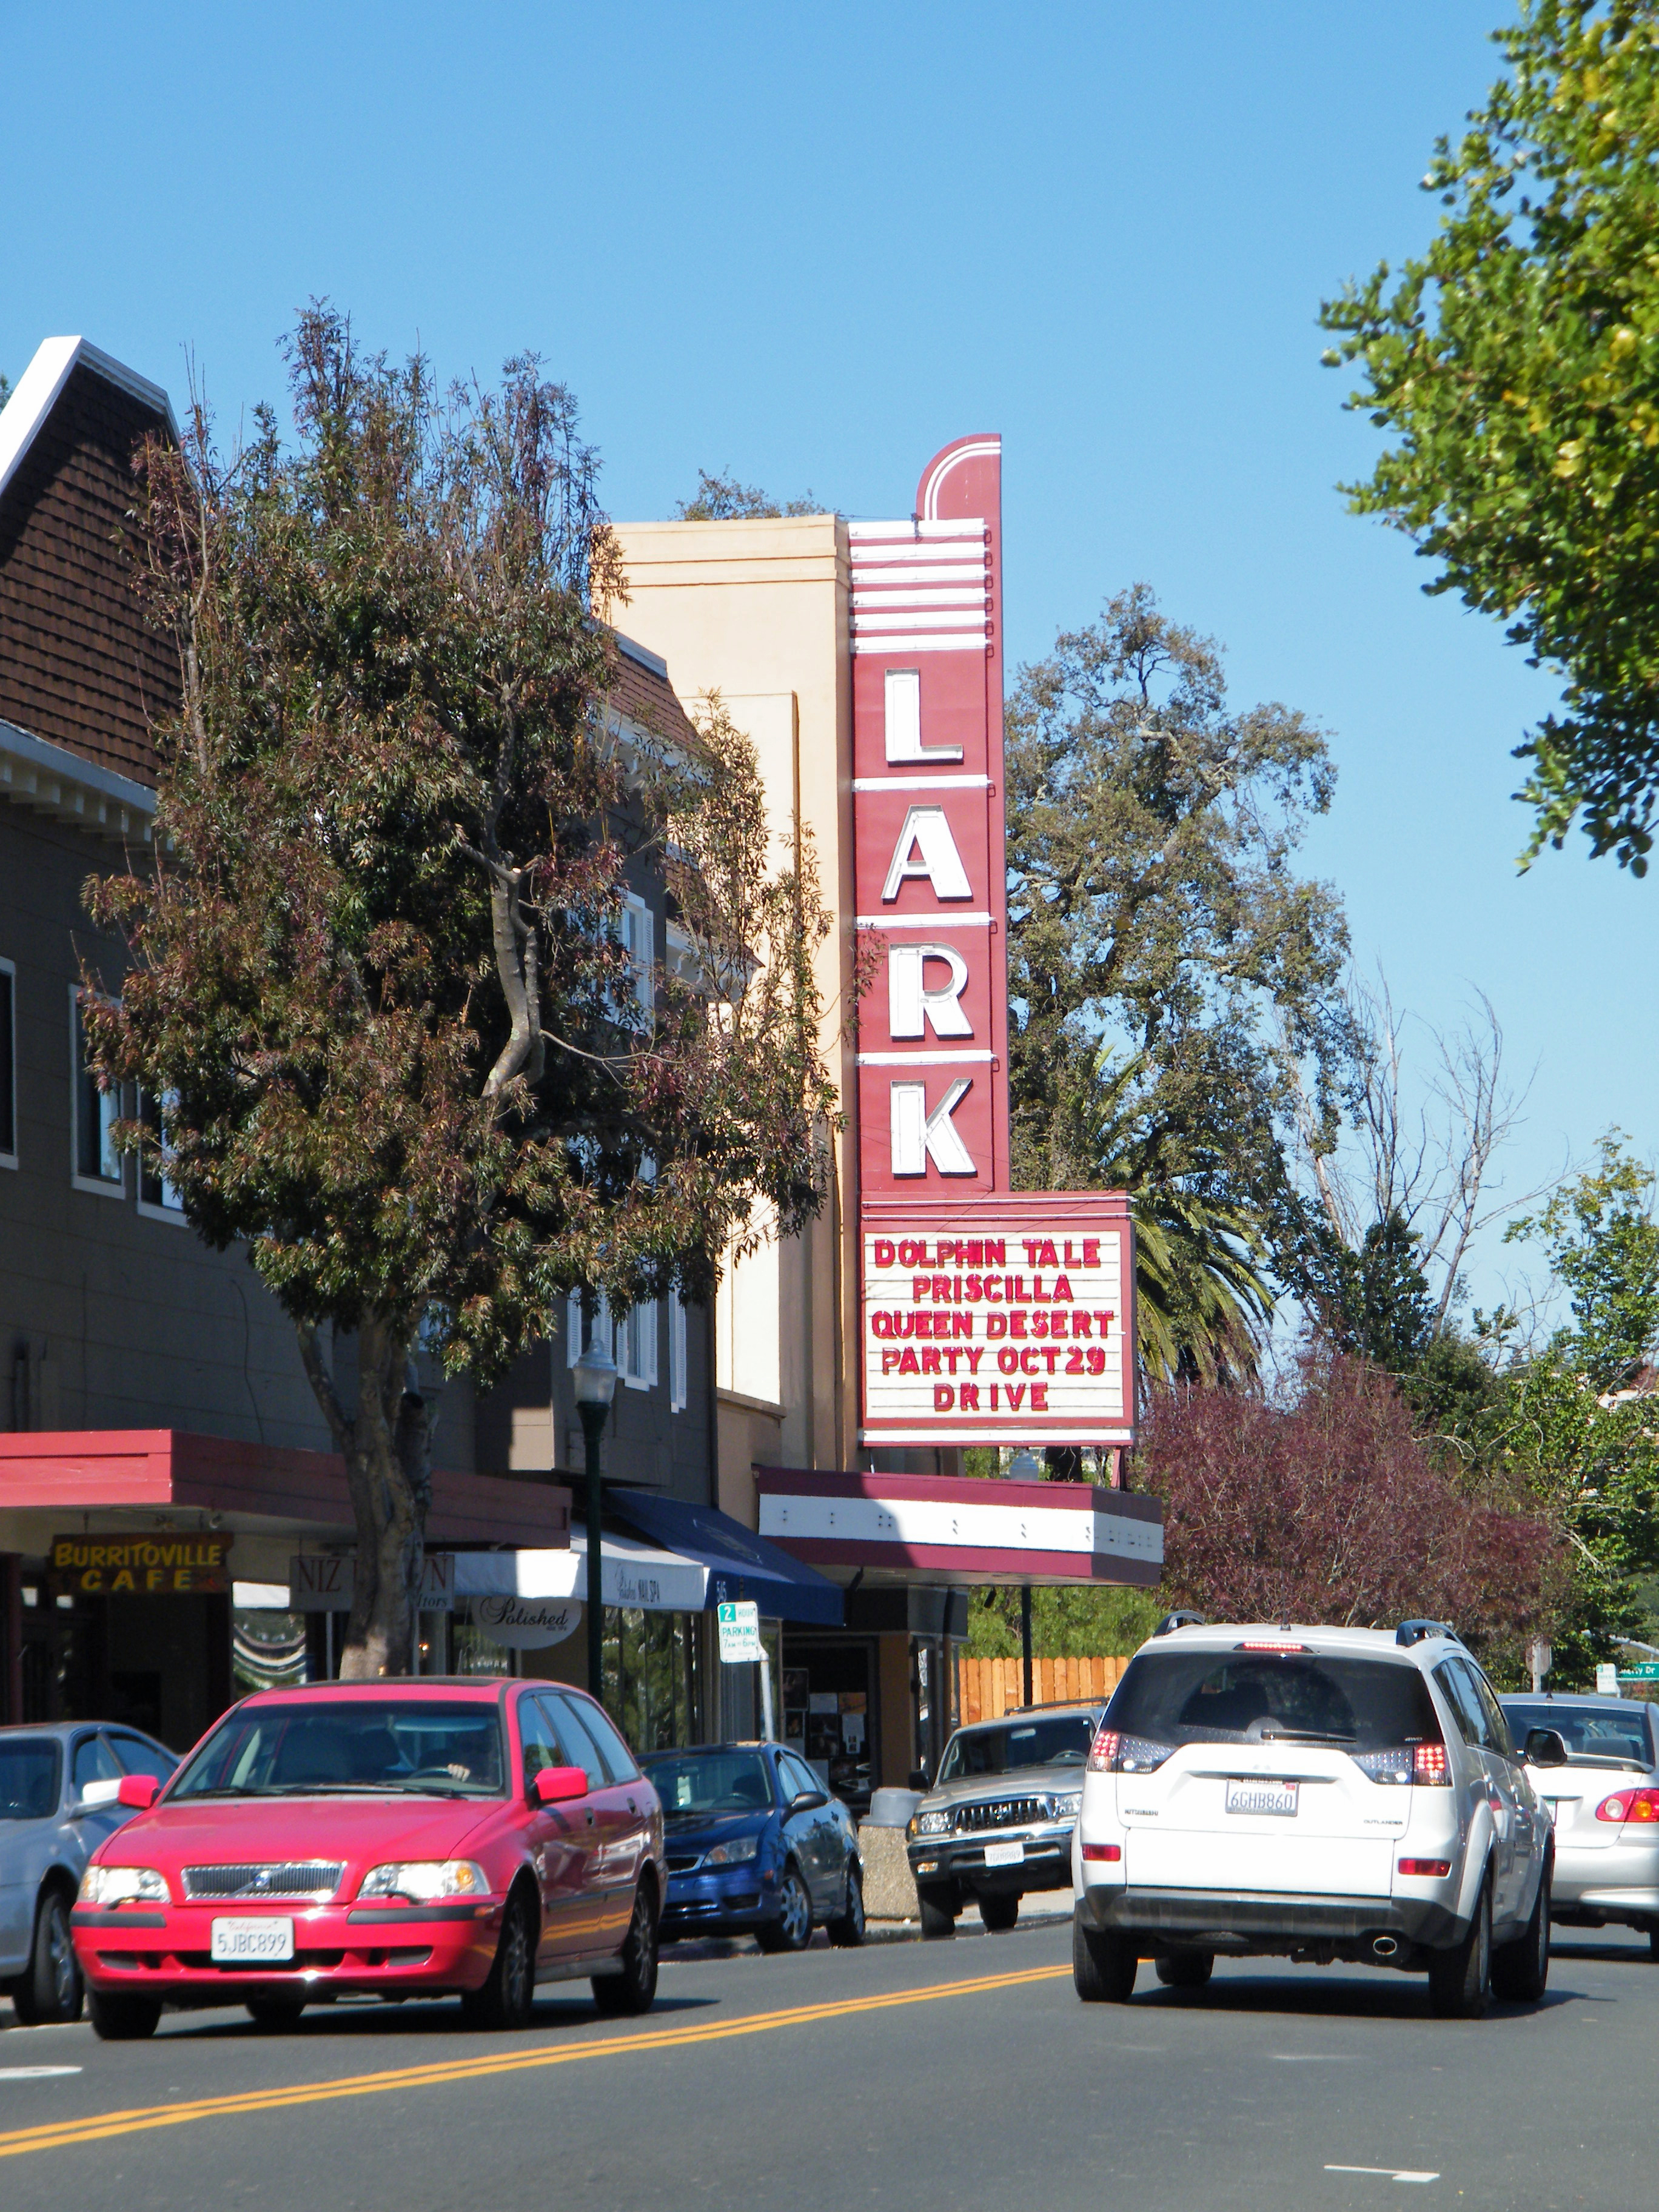 File:Downtown Larkspur, California 2011 A - Stierch.jpg ...